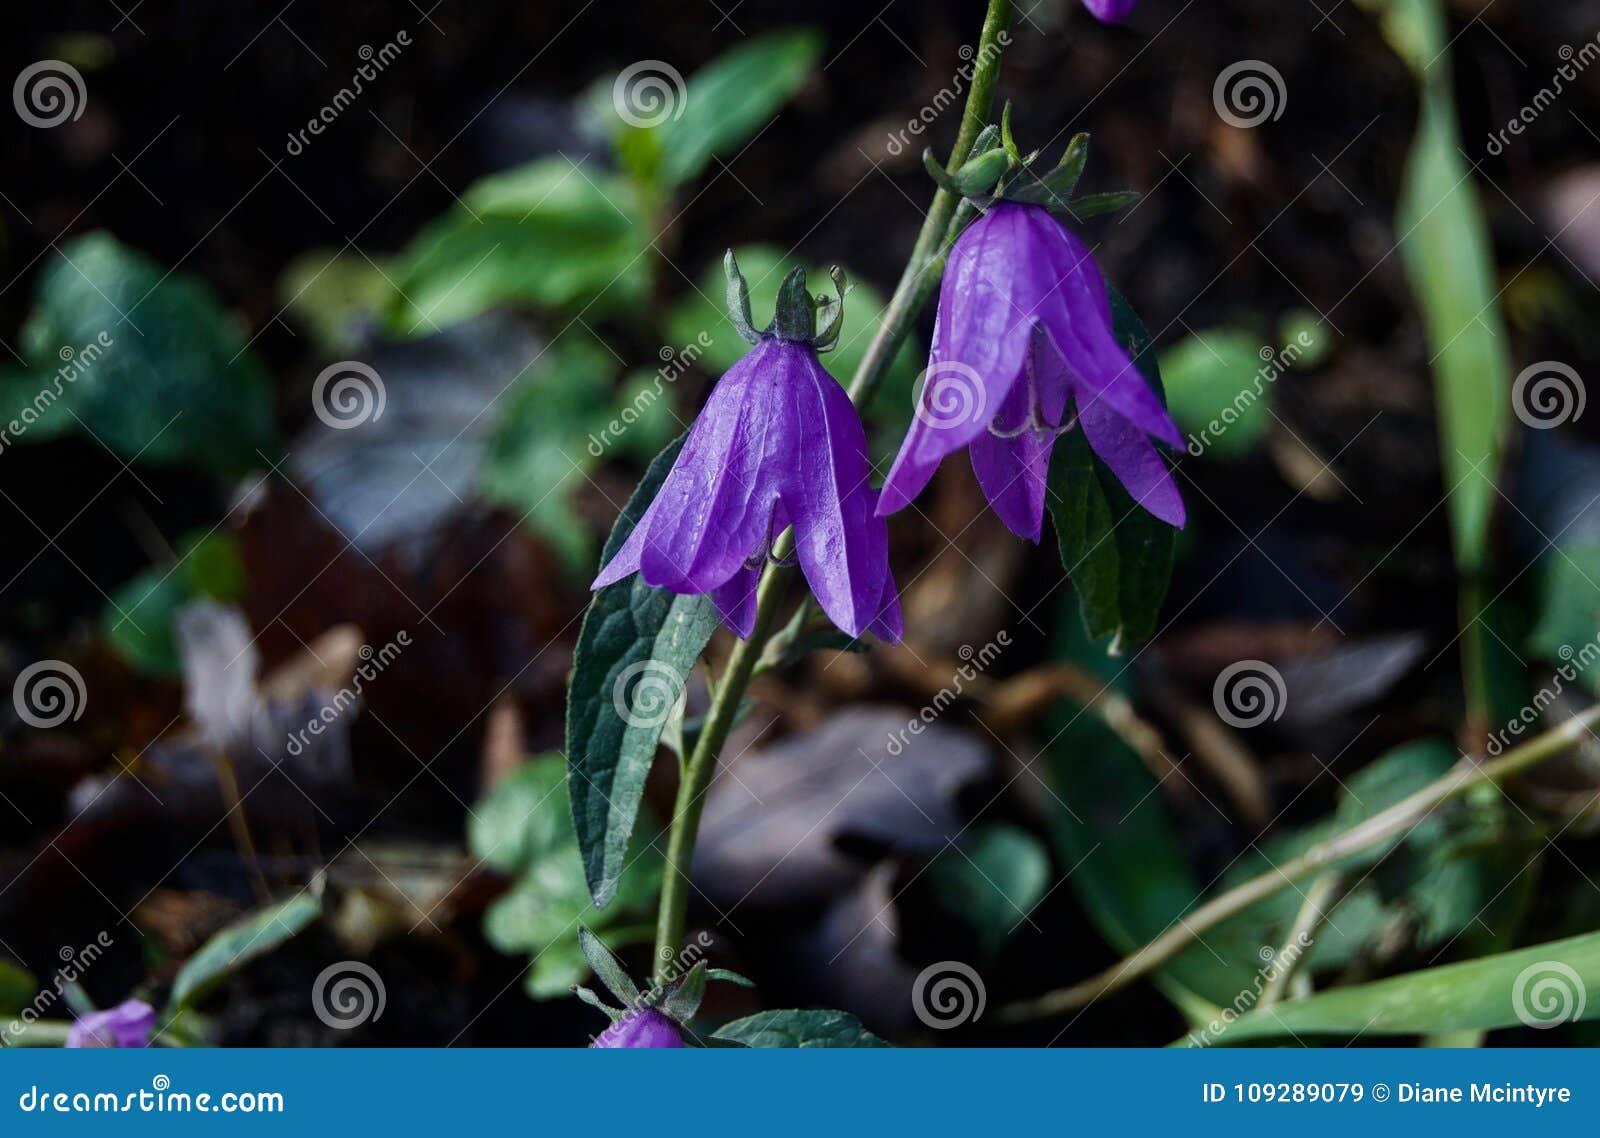 Purple Bell Flower Amid Lush Green Foliage Stock Image Image Of